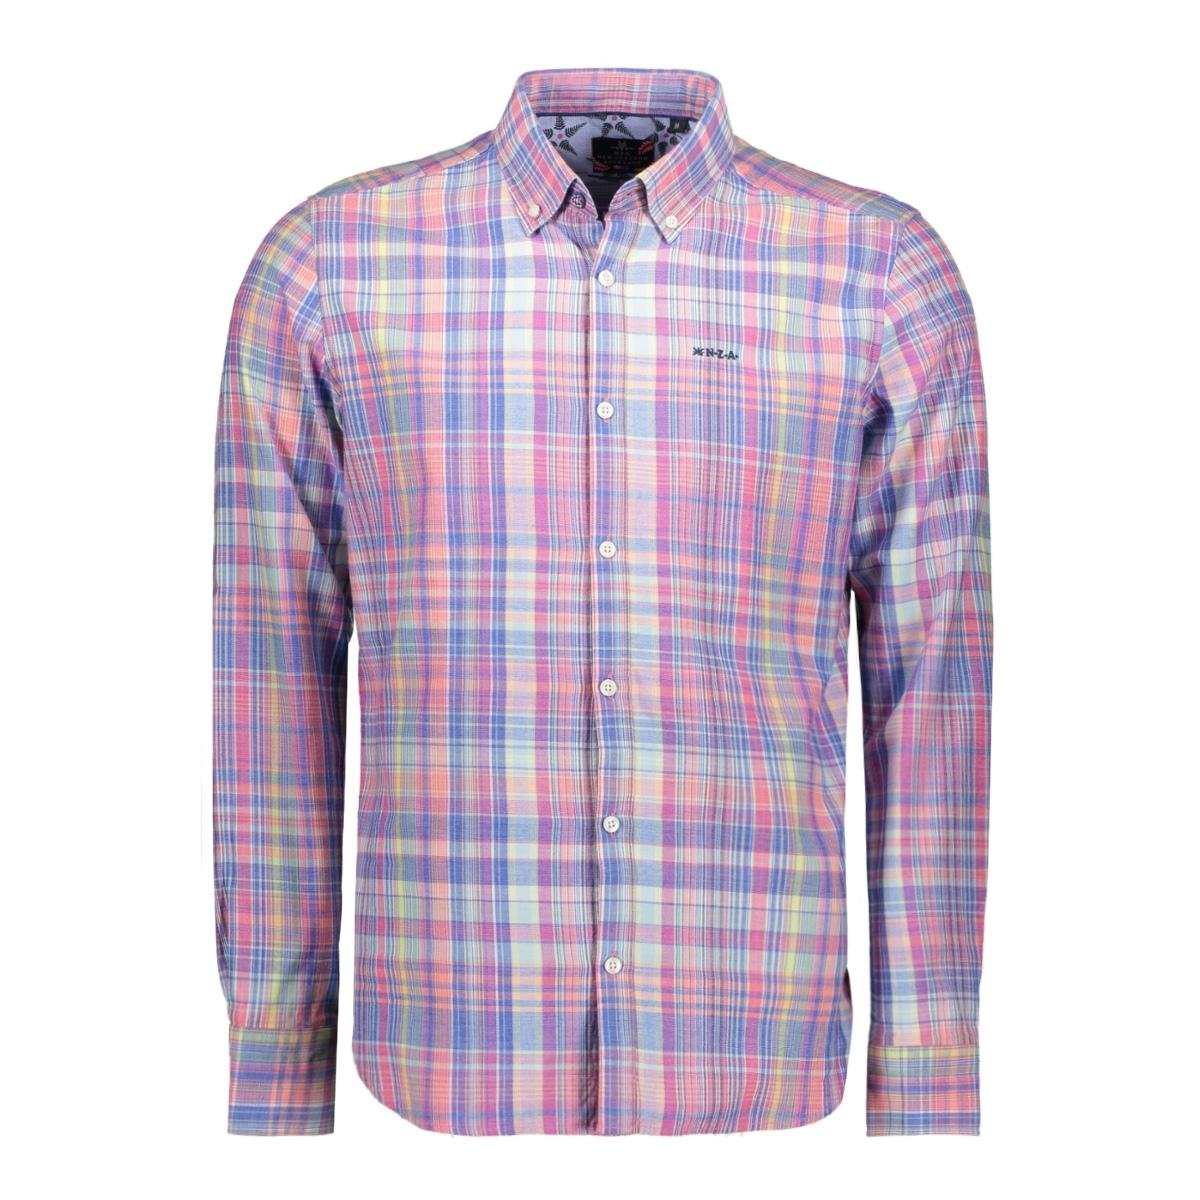 wapiti 19bn542 nza overhemd 800 multicolor